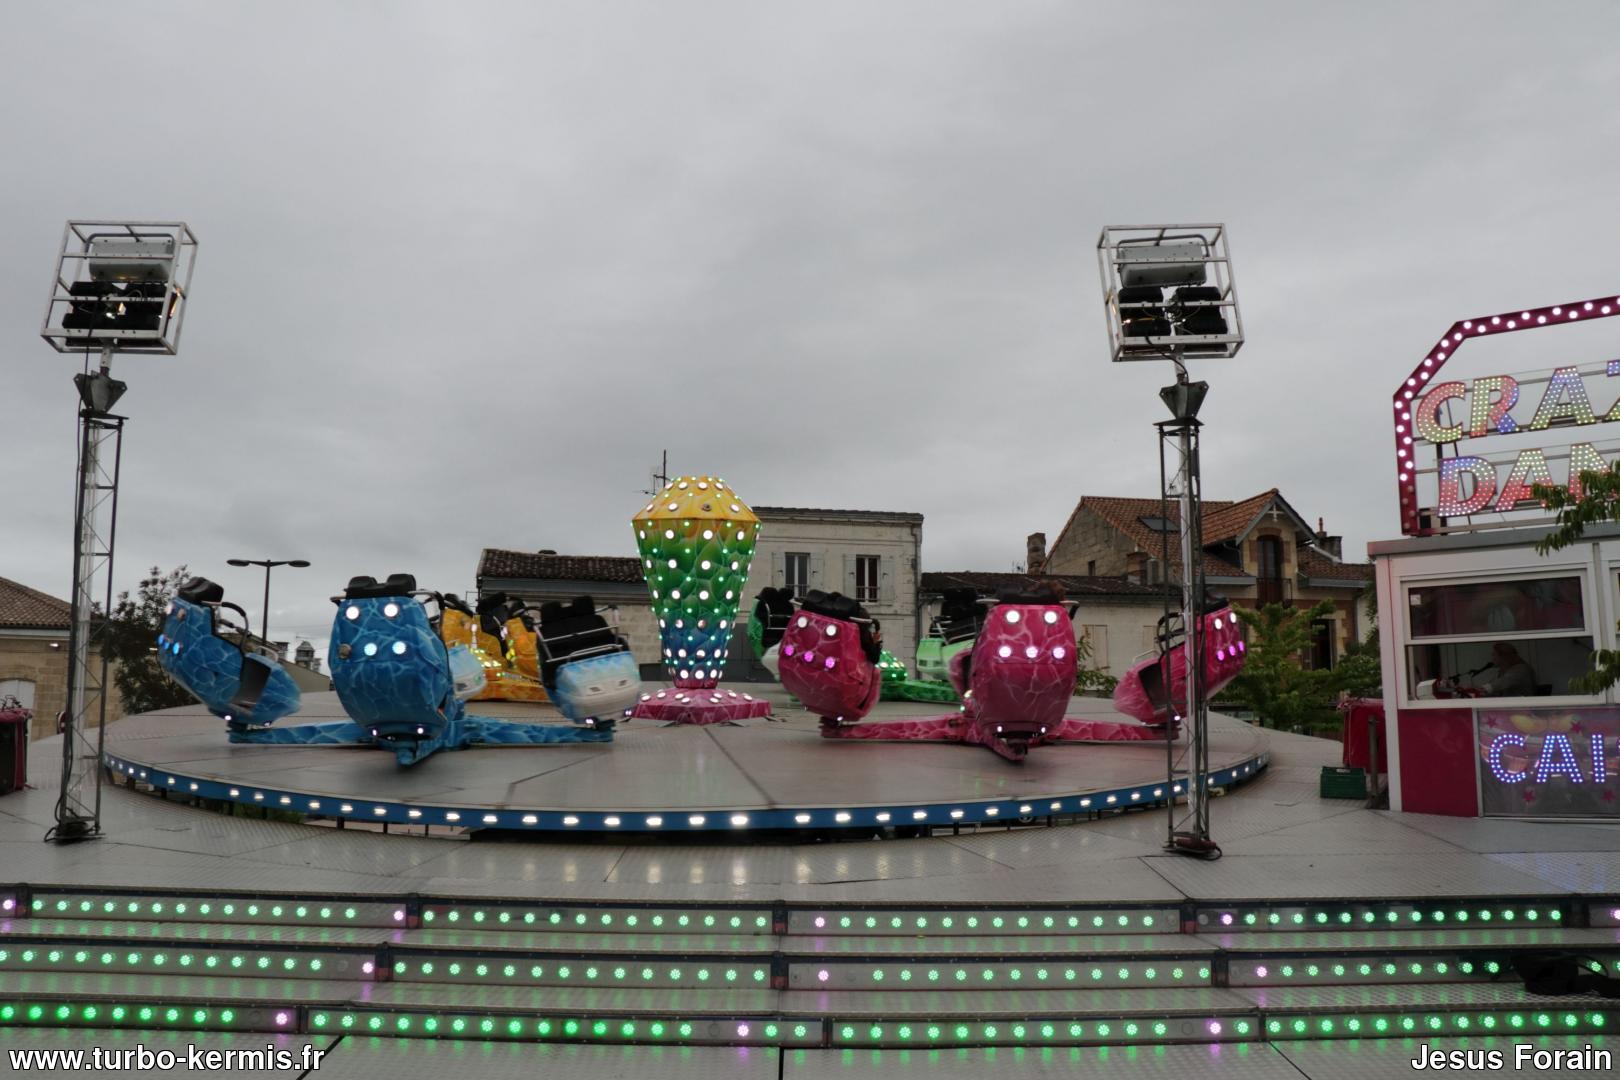 https://www.turbo-kermis.fr/gallery/img_turbo-kermis_74913.jpg